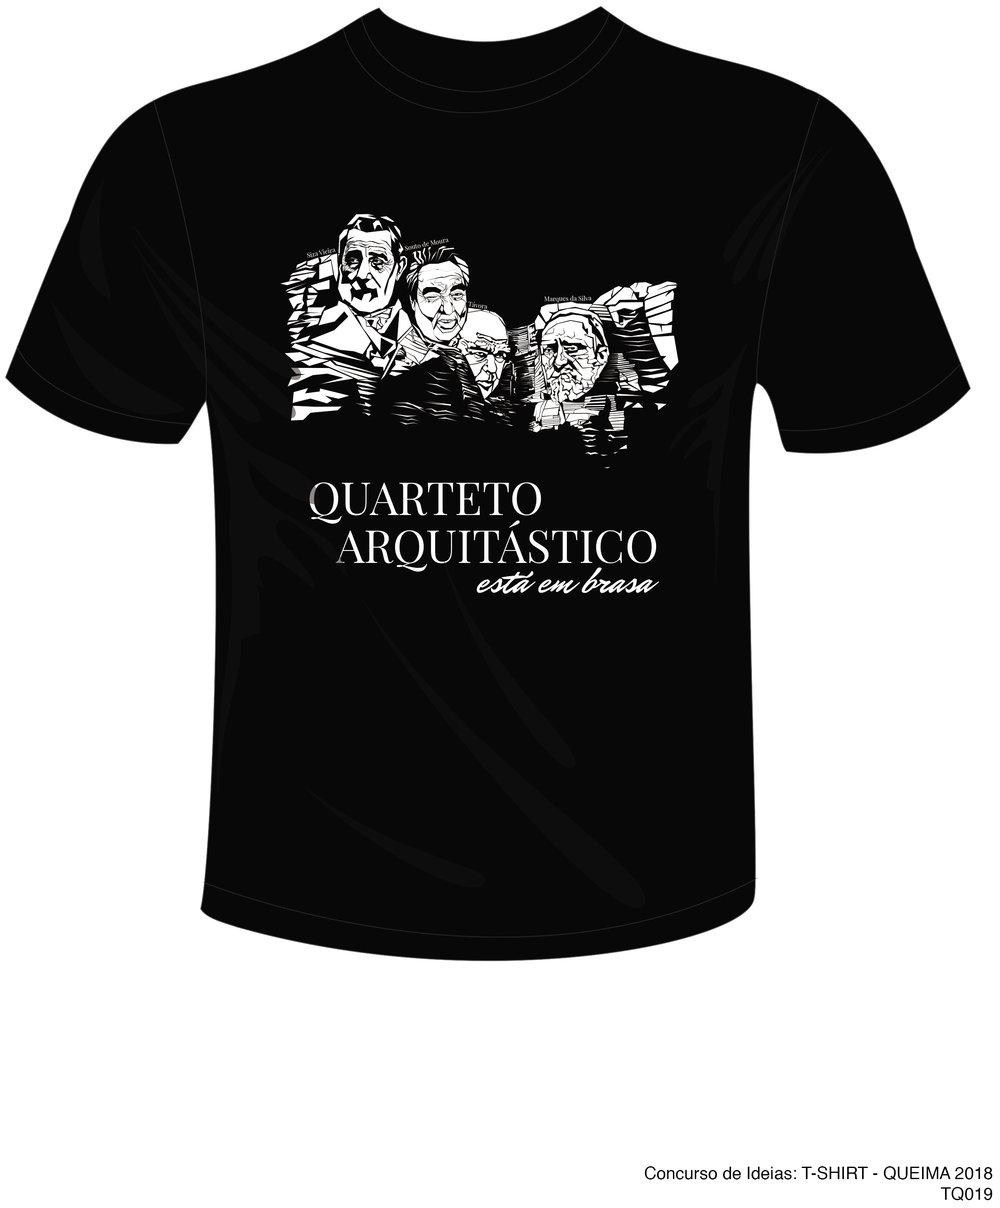 T Shirt Queima